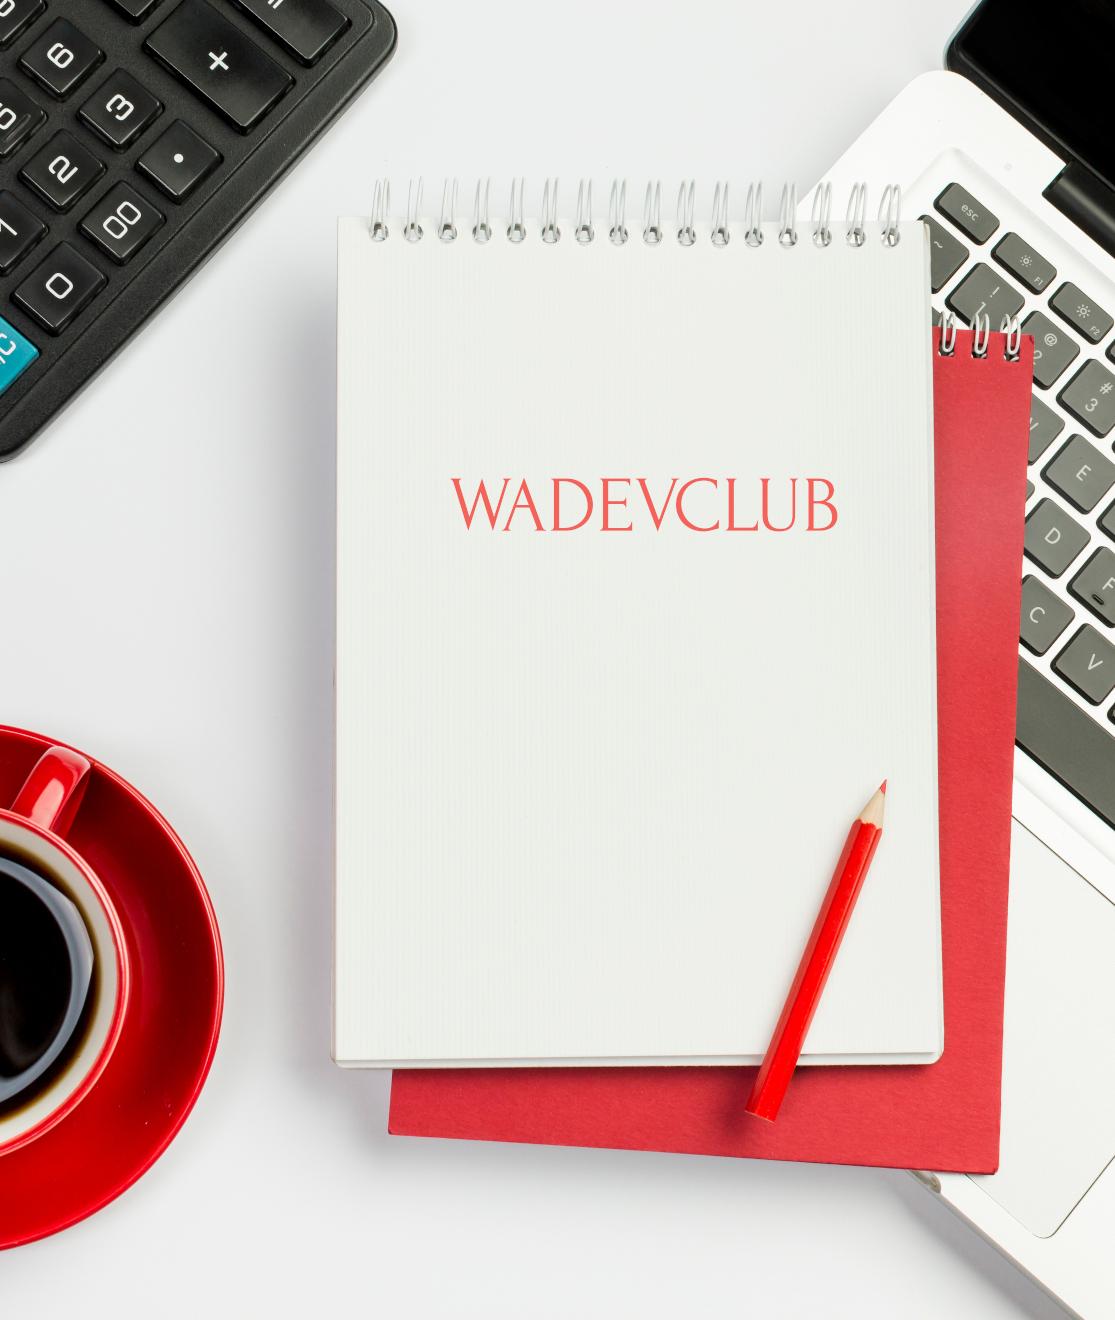 wadevclub